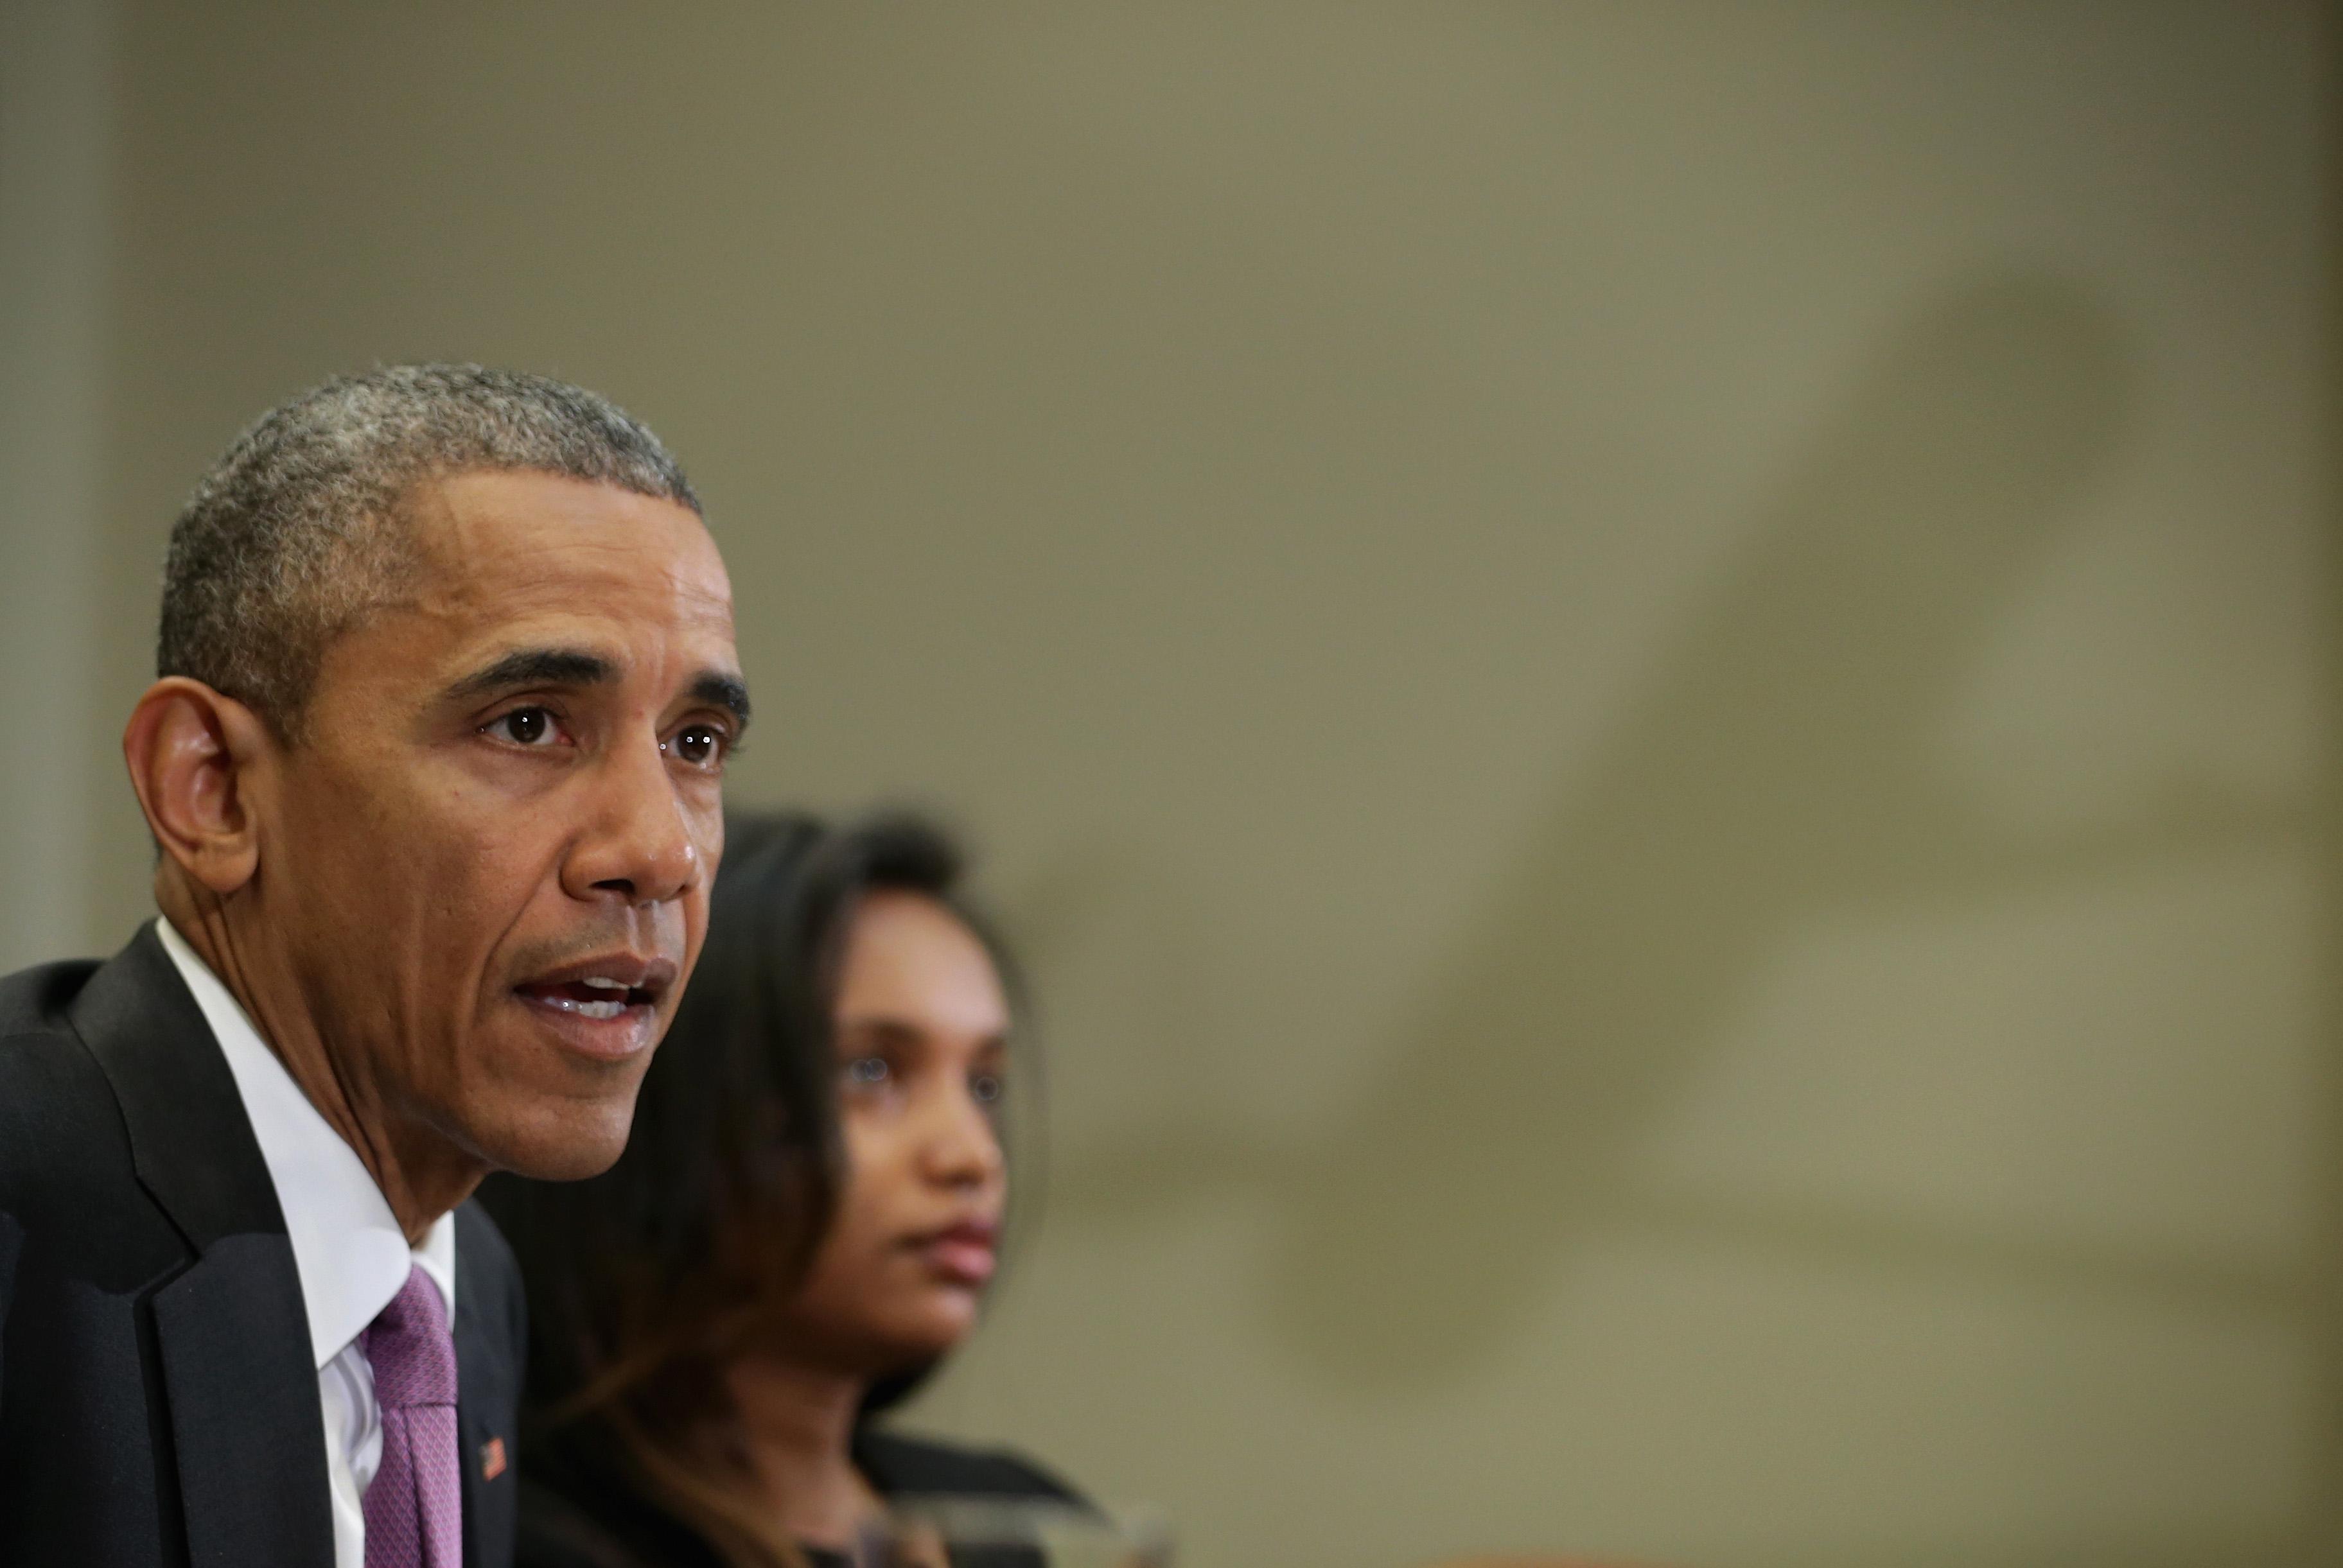 Obama opens up on Iran - Vox